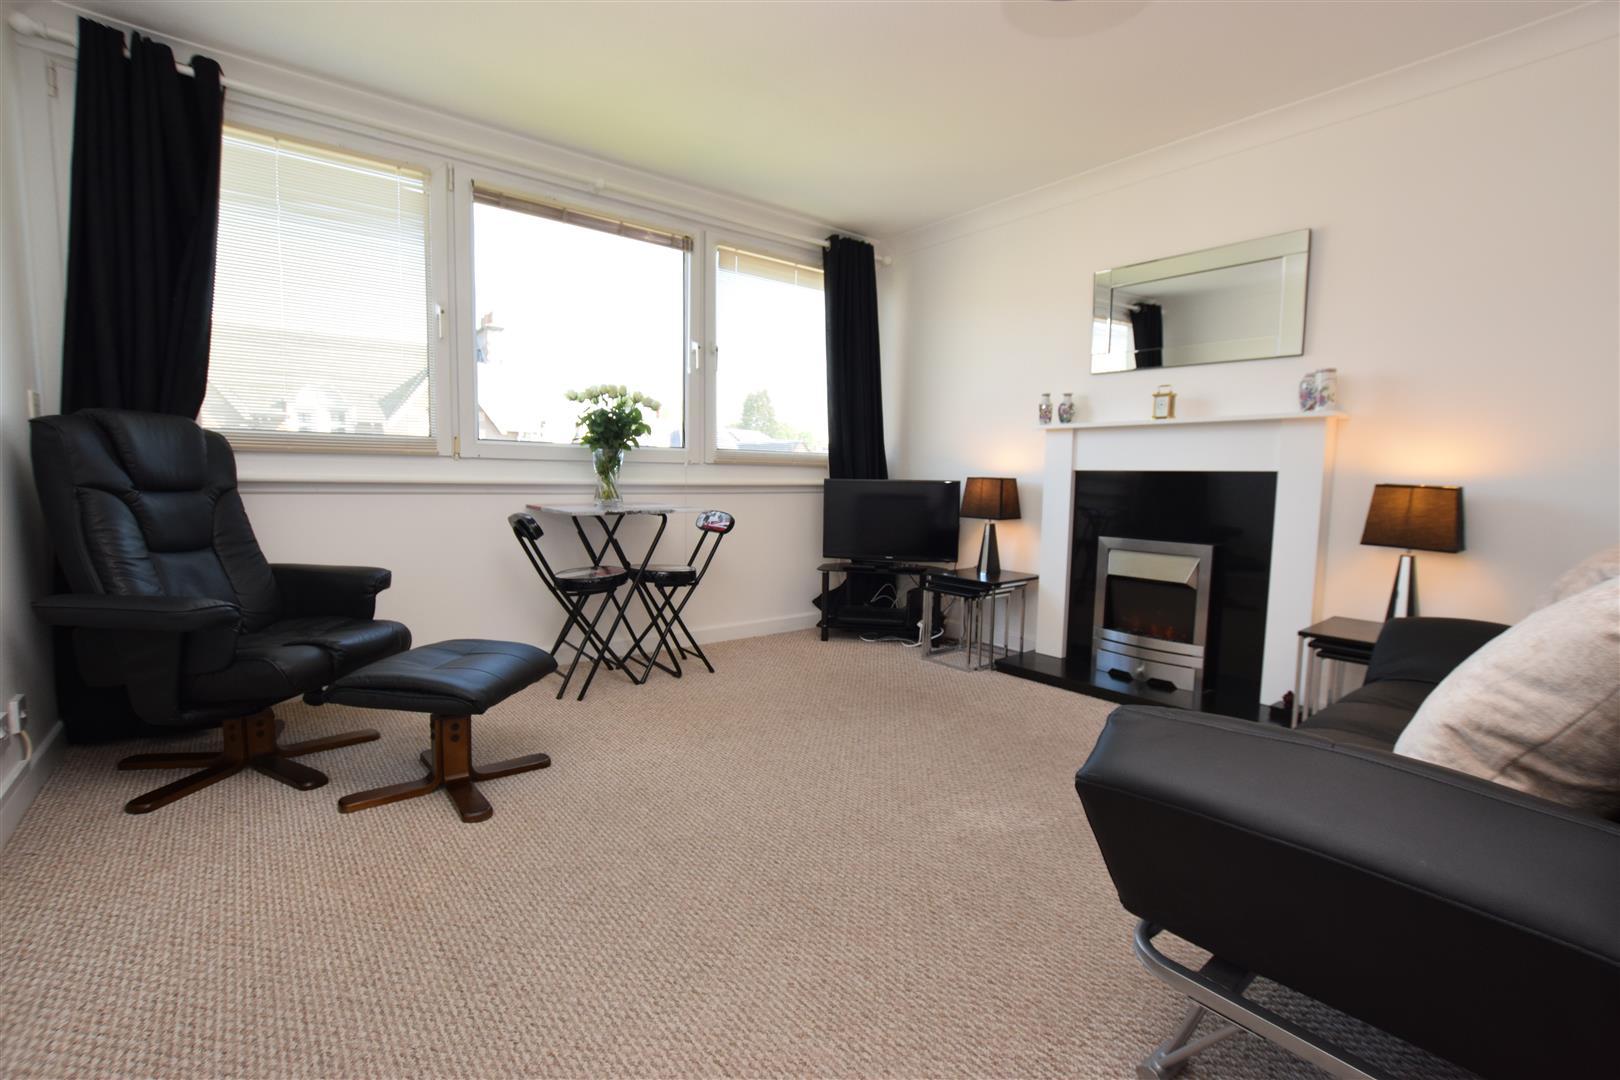 44, Muirton Place, Perth, Perthshire, PH1 5DL, UK